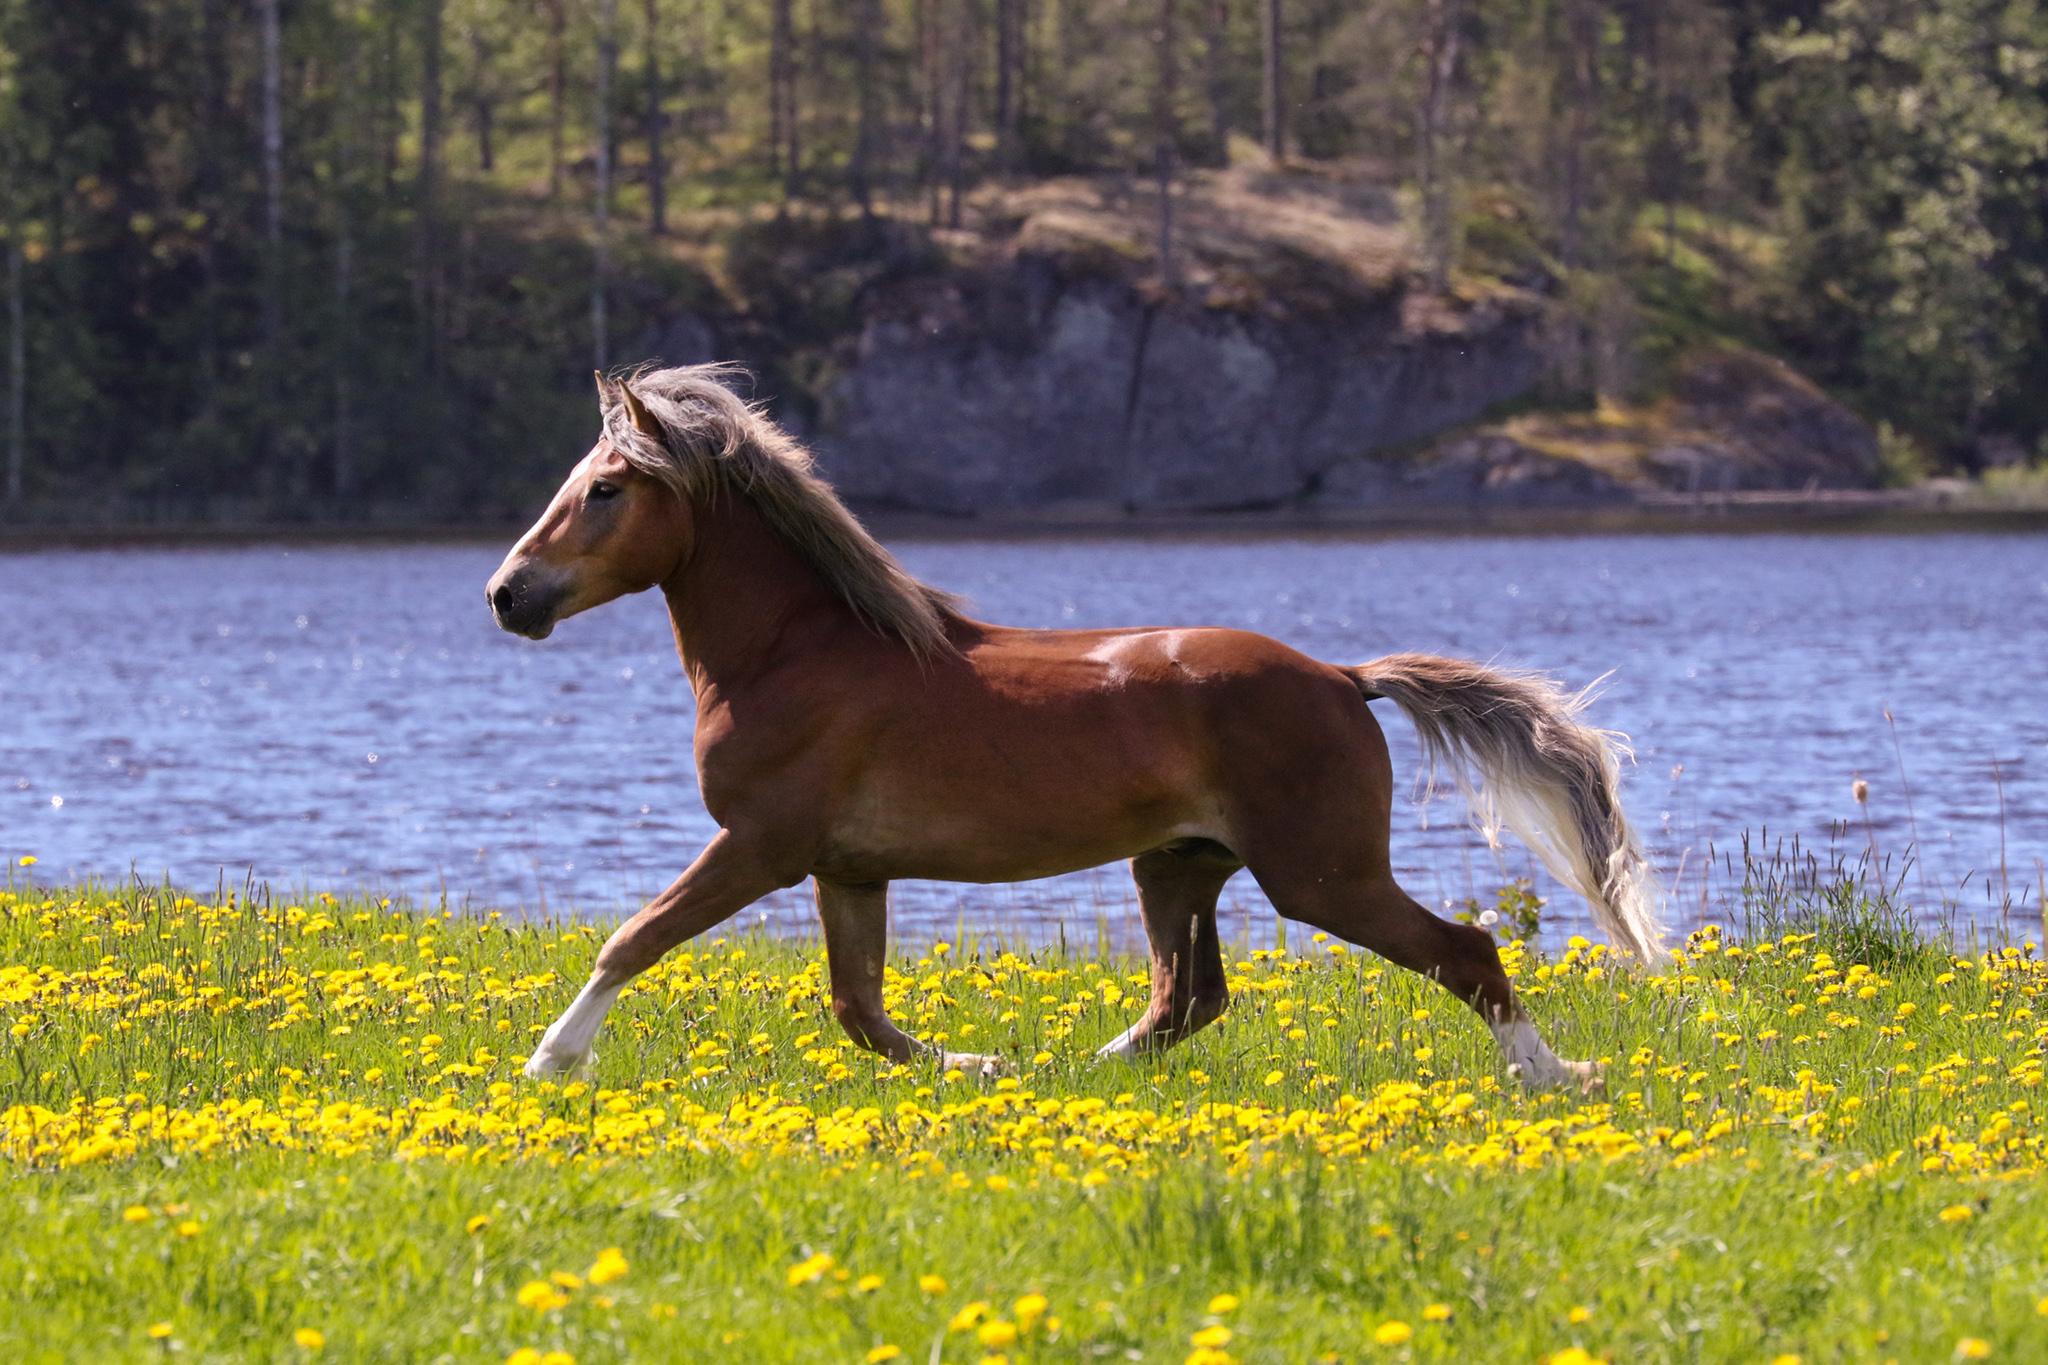 Suomenhevonen /Finnhorse